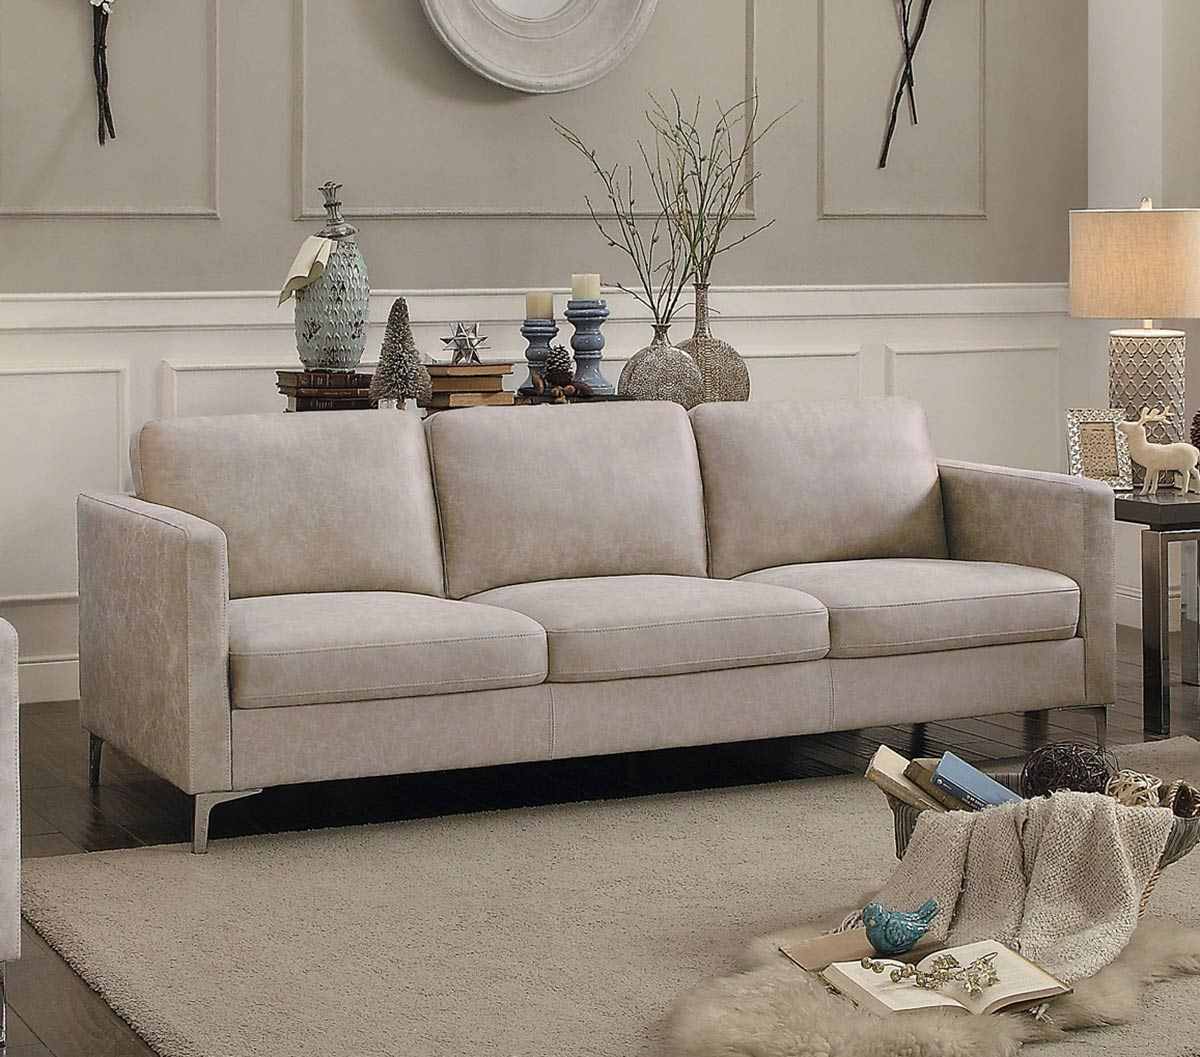 Homelegance Breaux Sofa - Sesame Fabric